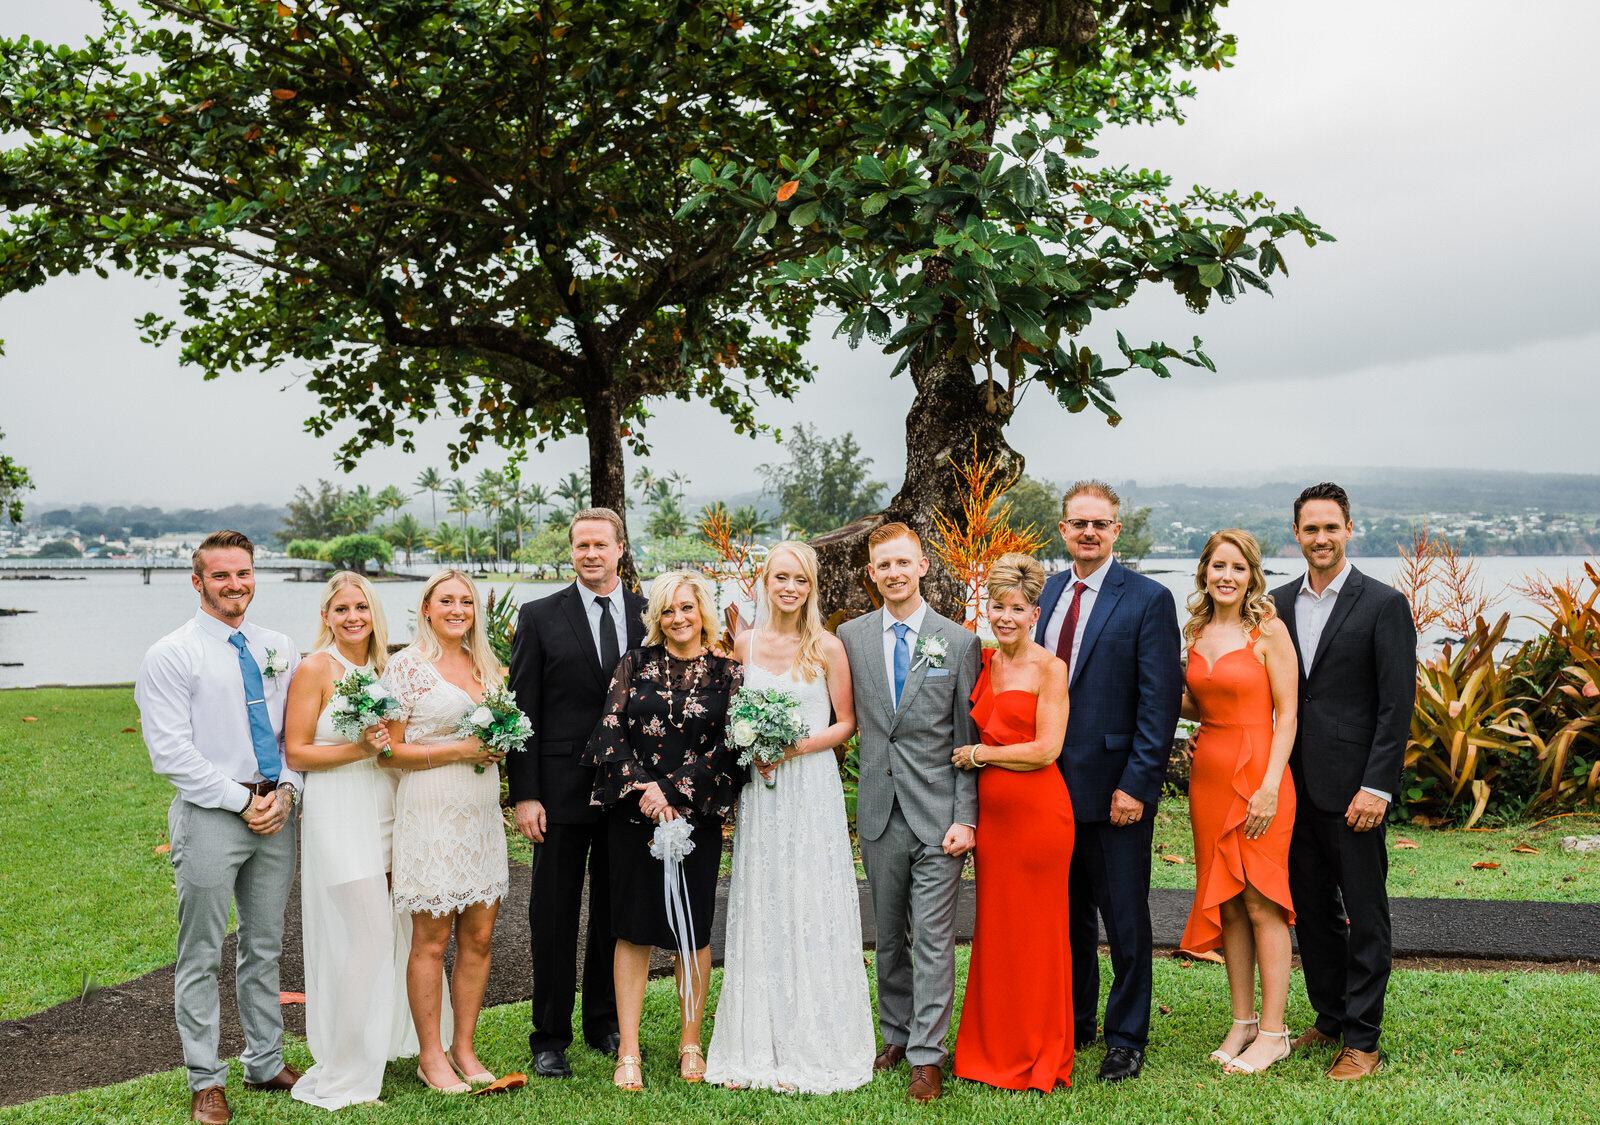 small-wedding-hawaii-destination-hilton-coconut-island-9916-1.jpg